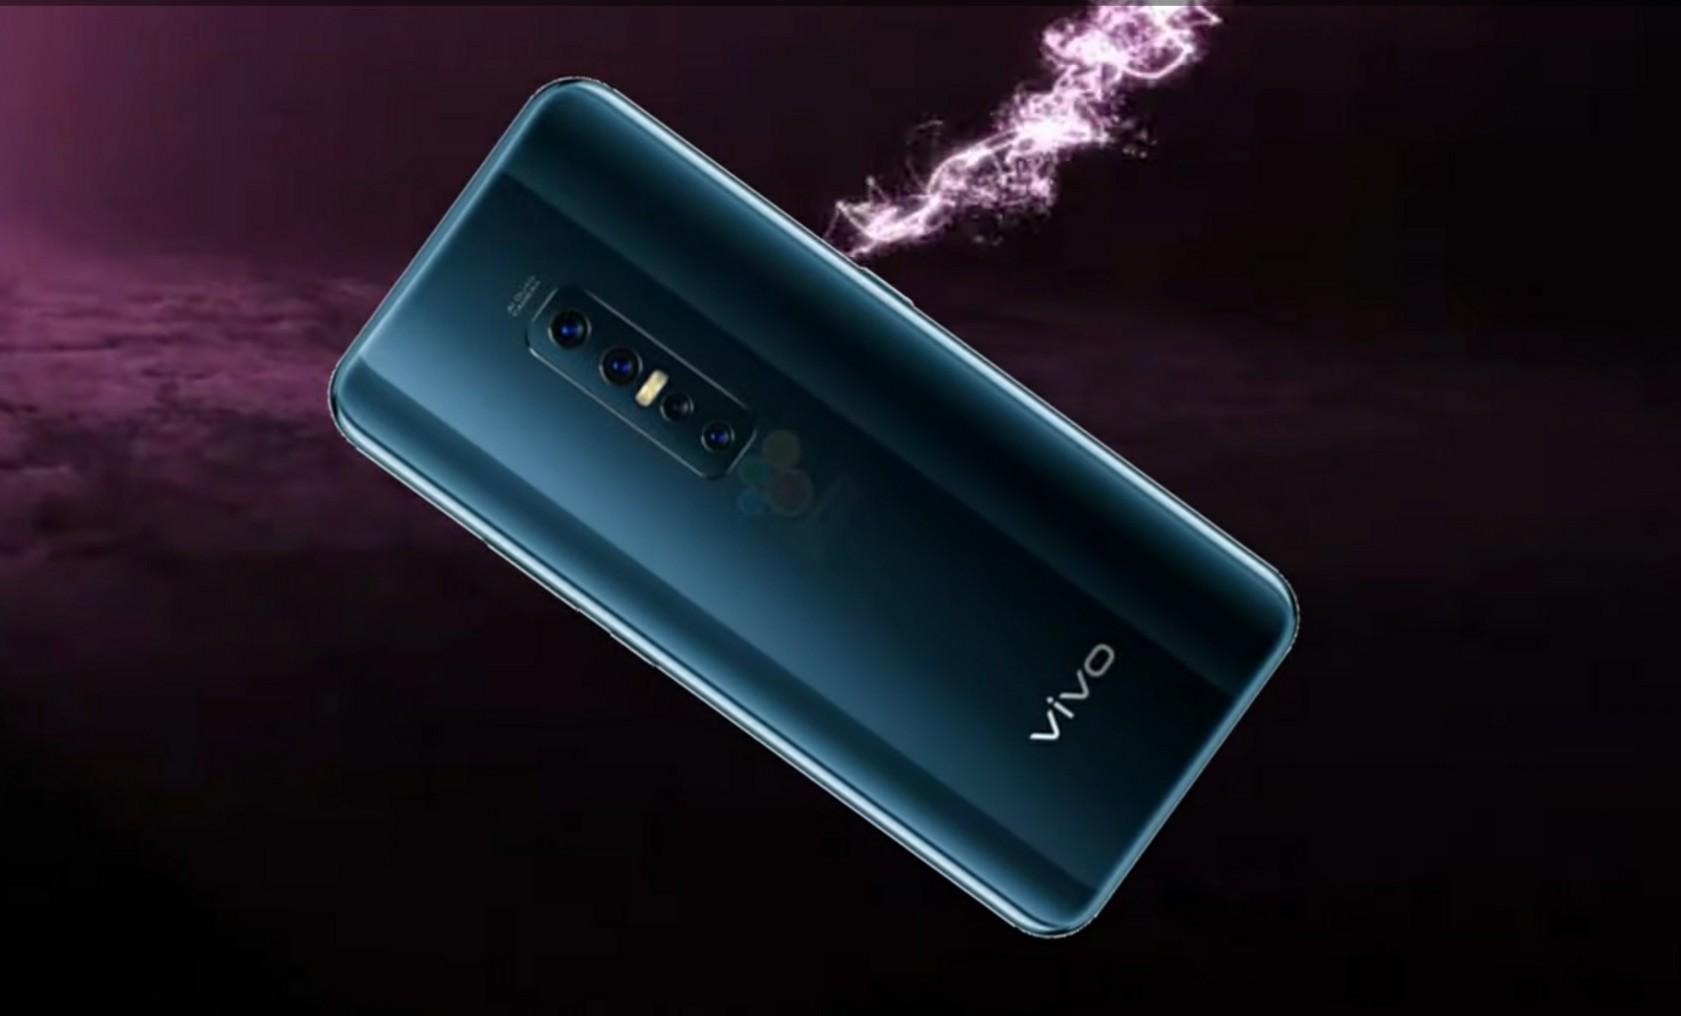 Смартфон Vivo V17 Pro — достоинства и недостатки